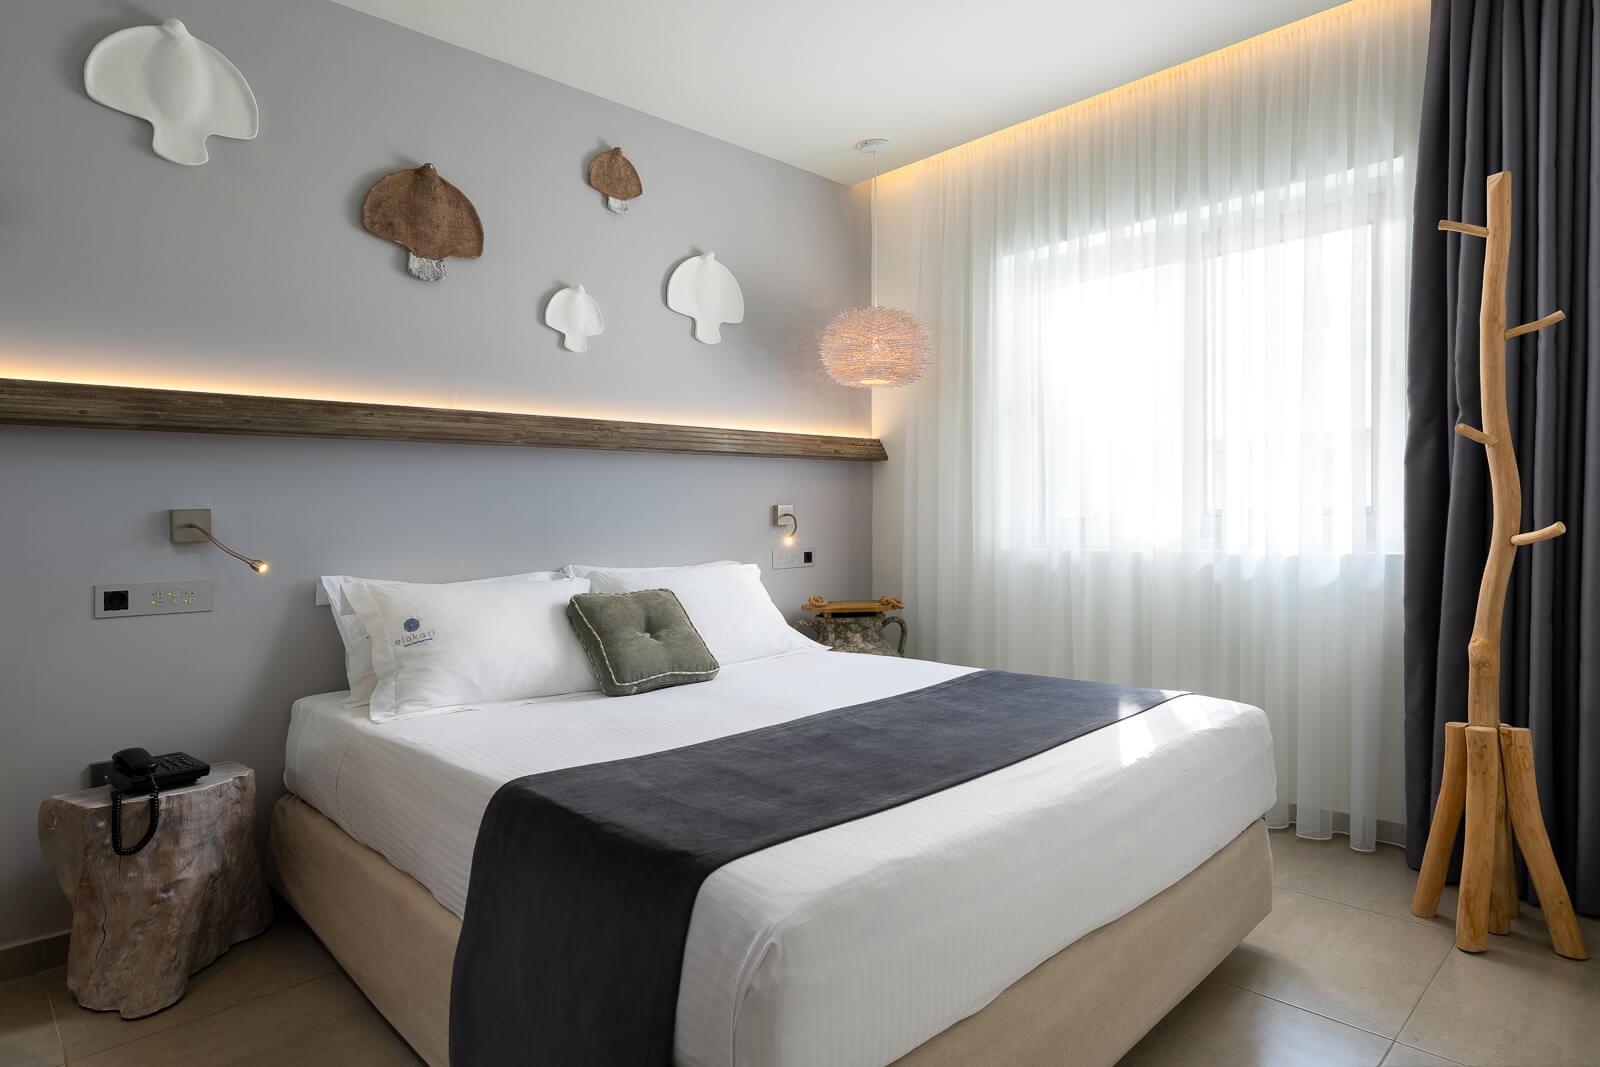 Nisos-Themed-Room-Elakati-Hotel-in-Rhodes-Greece